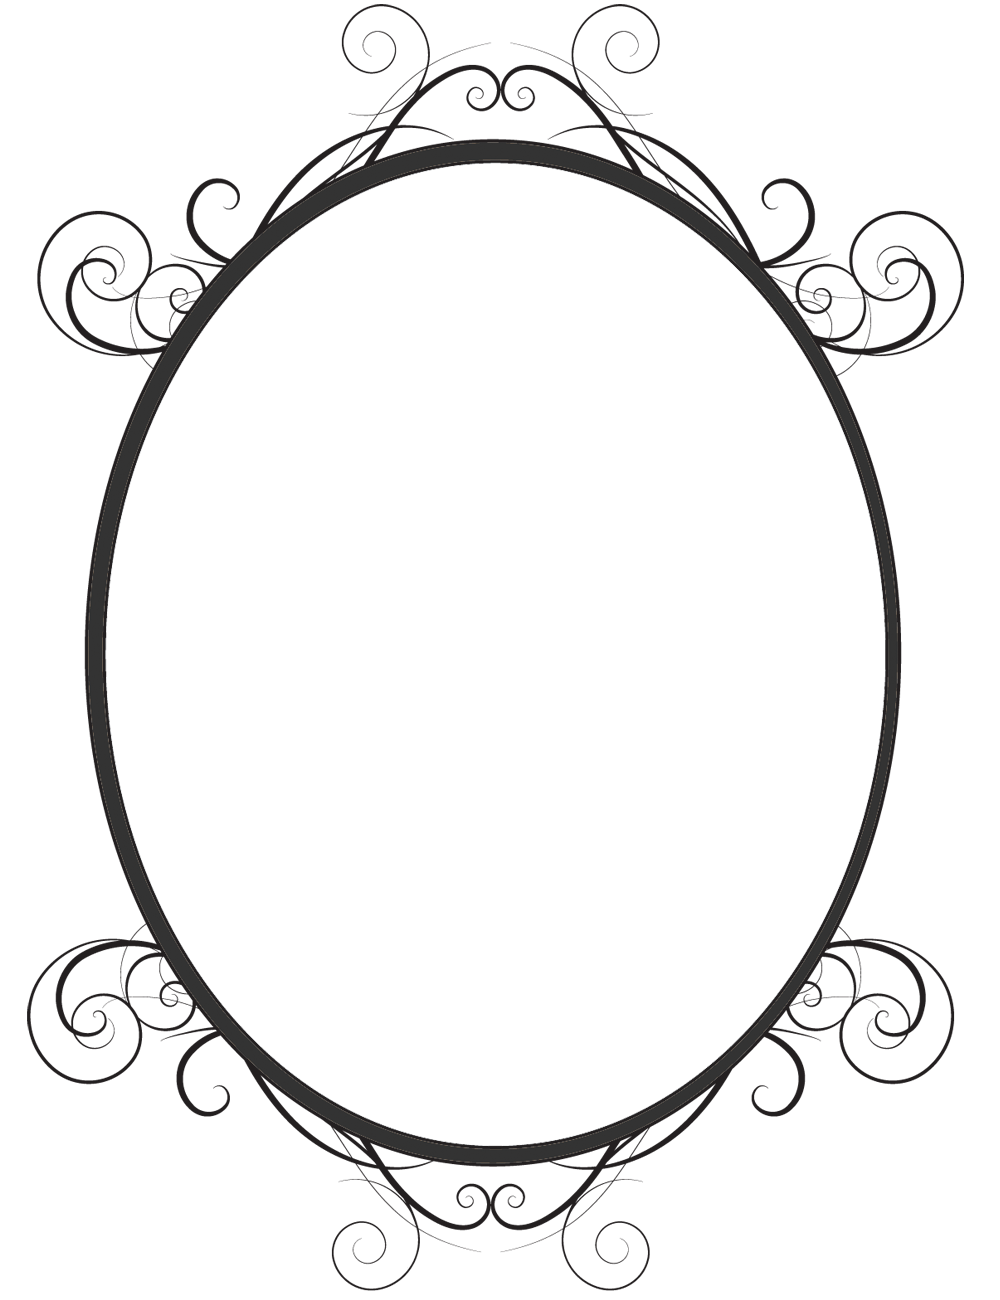 Frame ms word